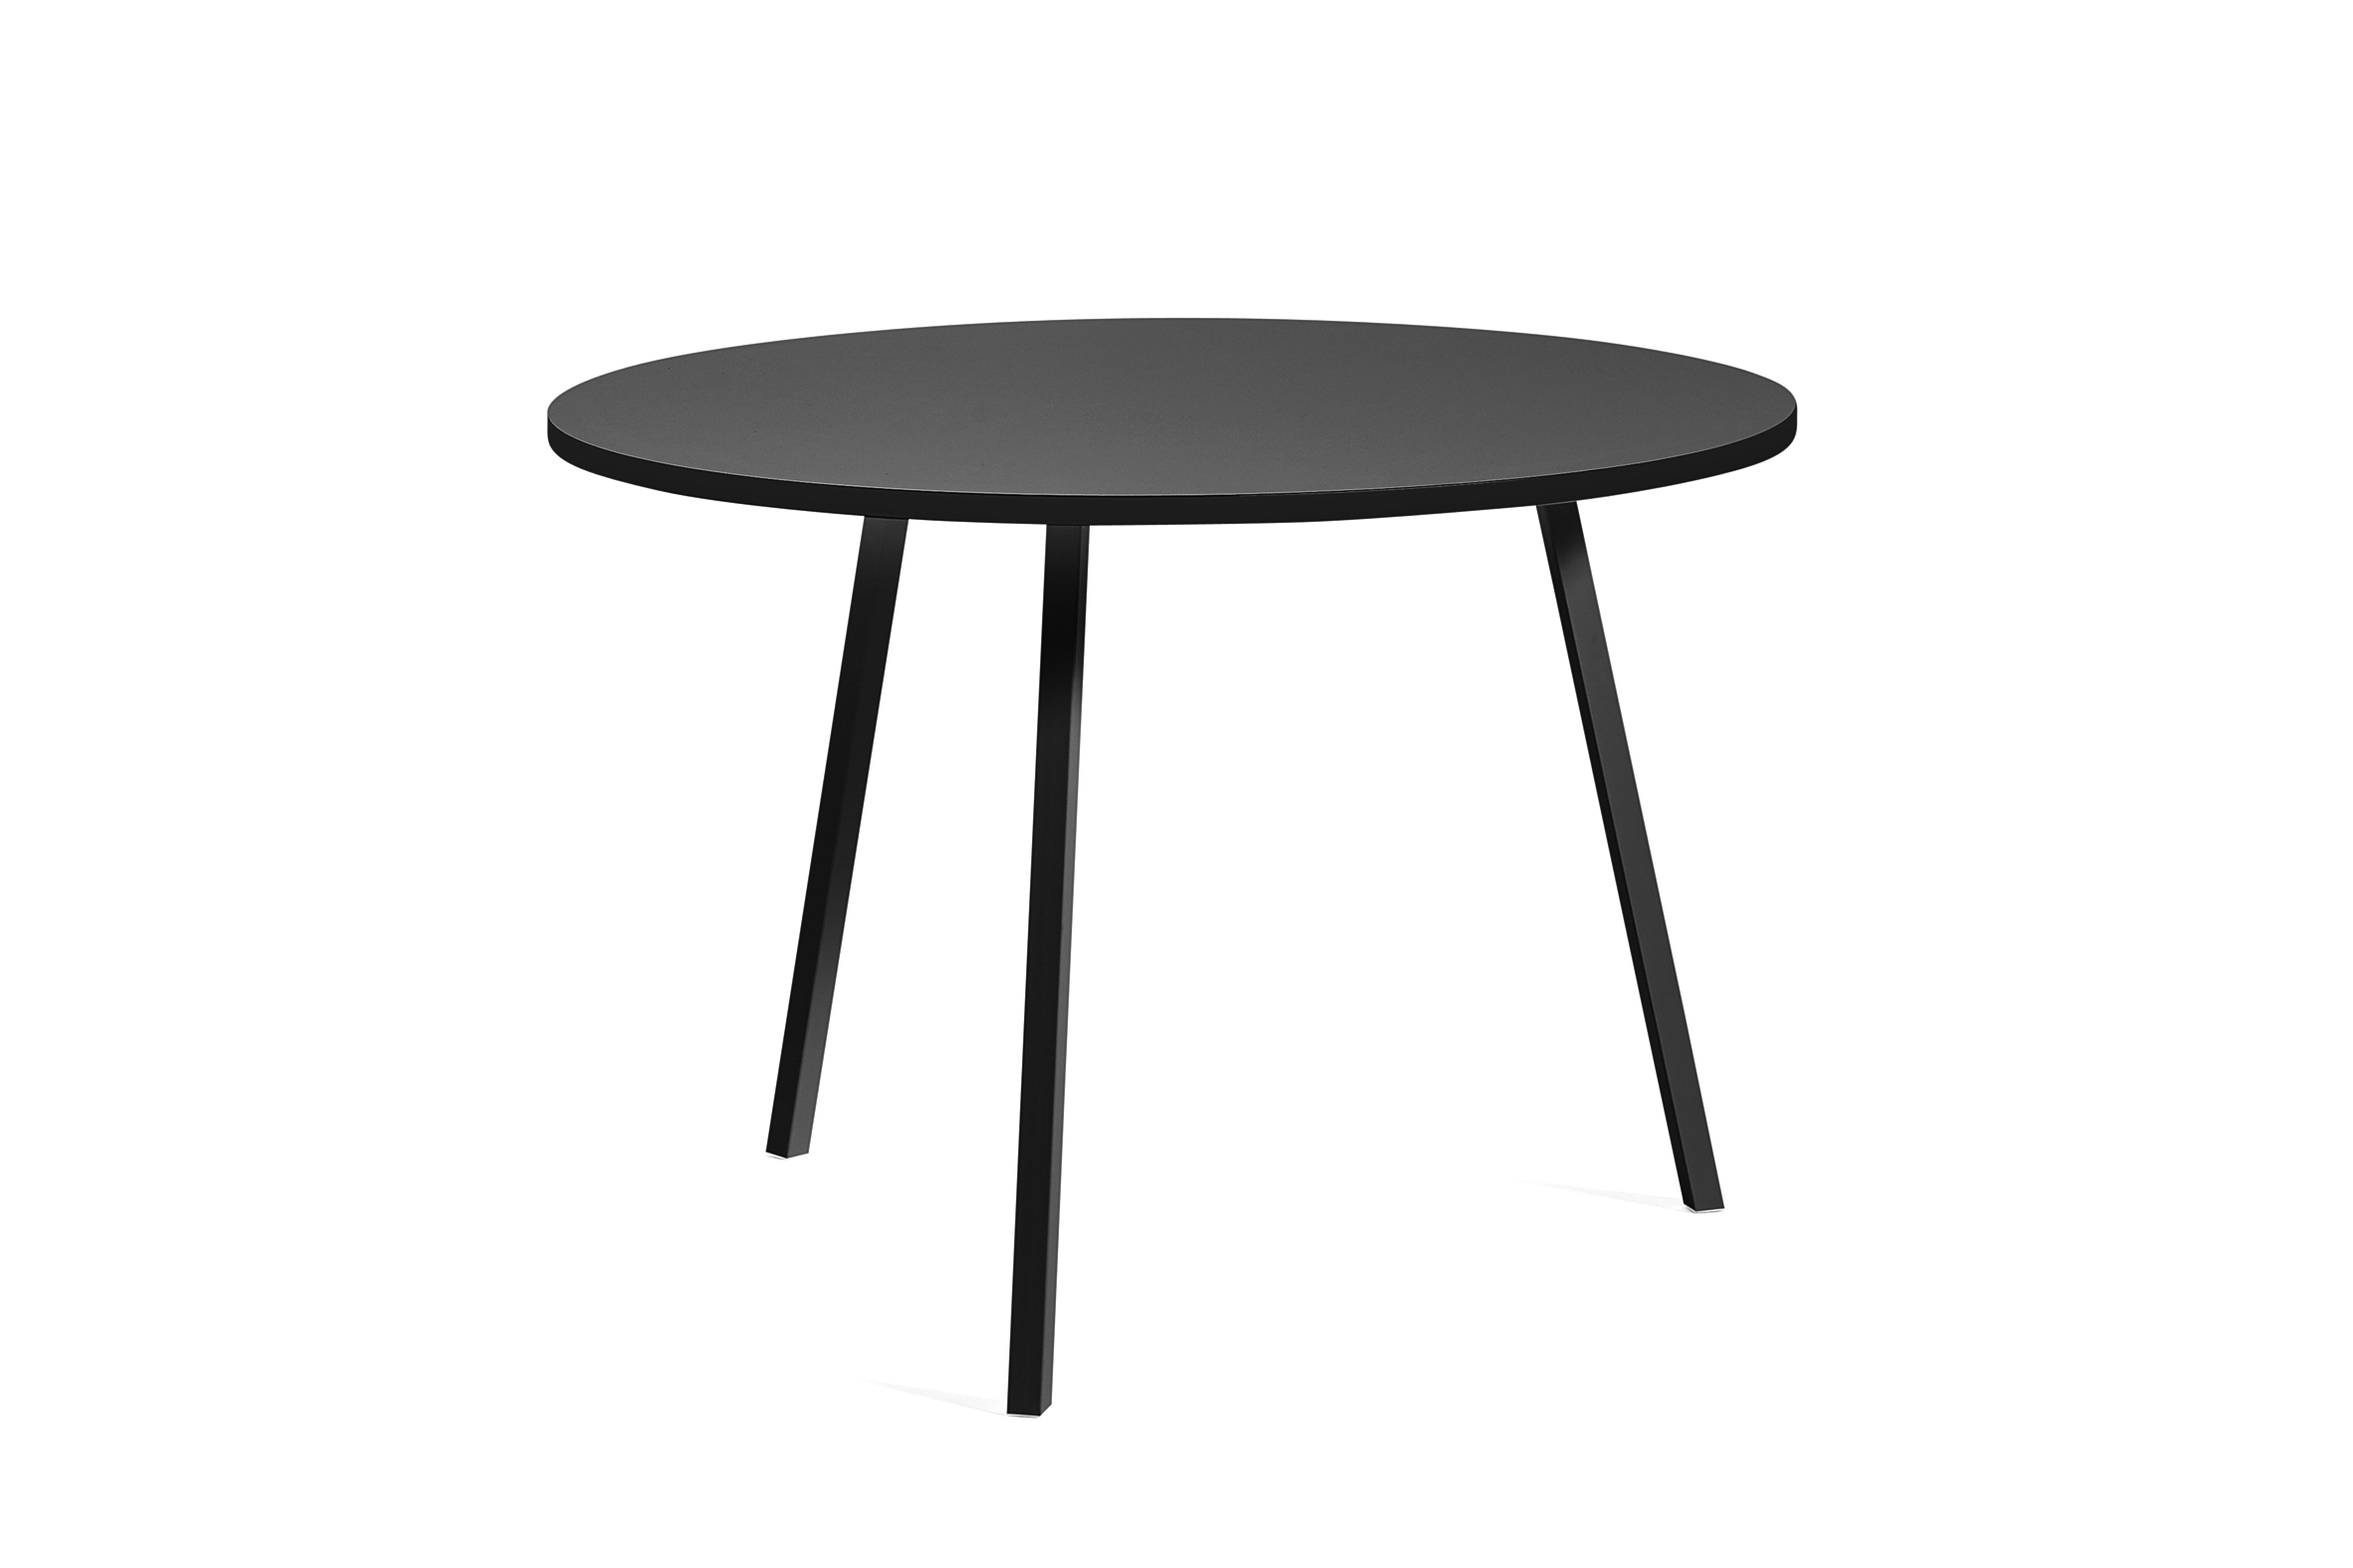 Loop stand round table black 105 cm